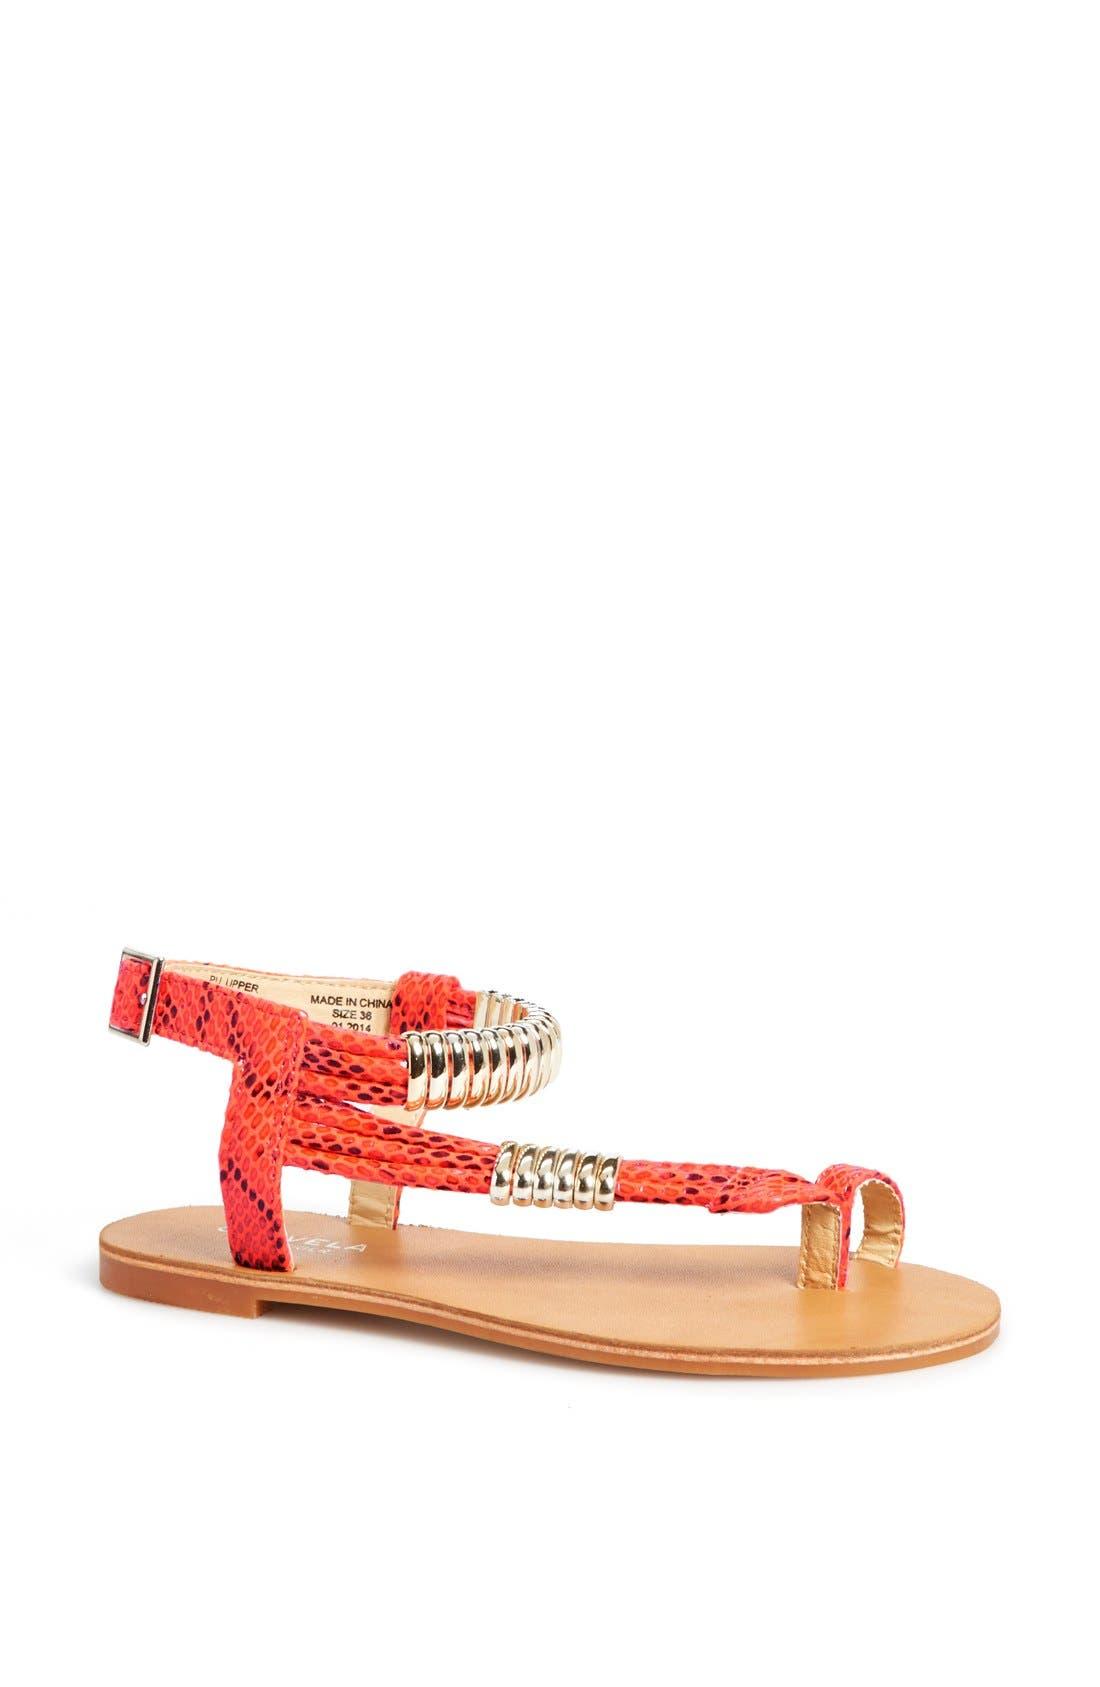 Main Image - Carvela Kurt Geiger 'Klipper' Sandal